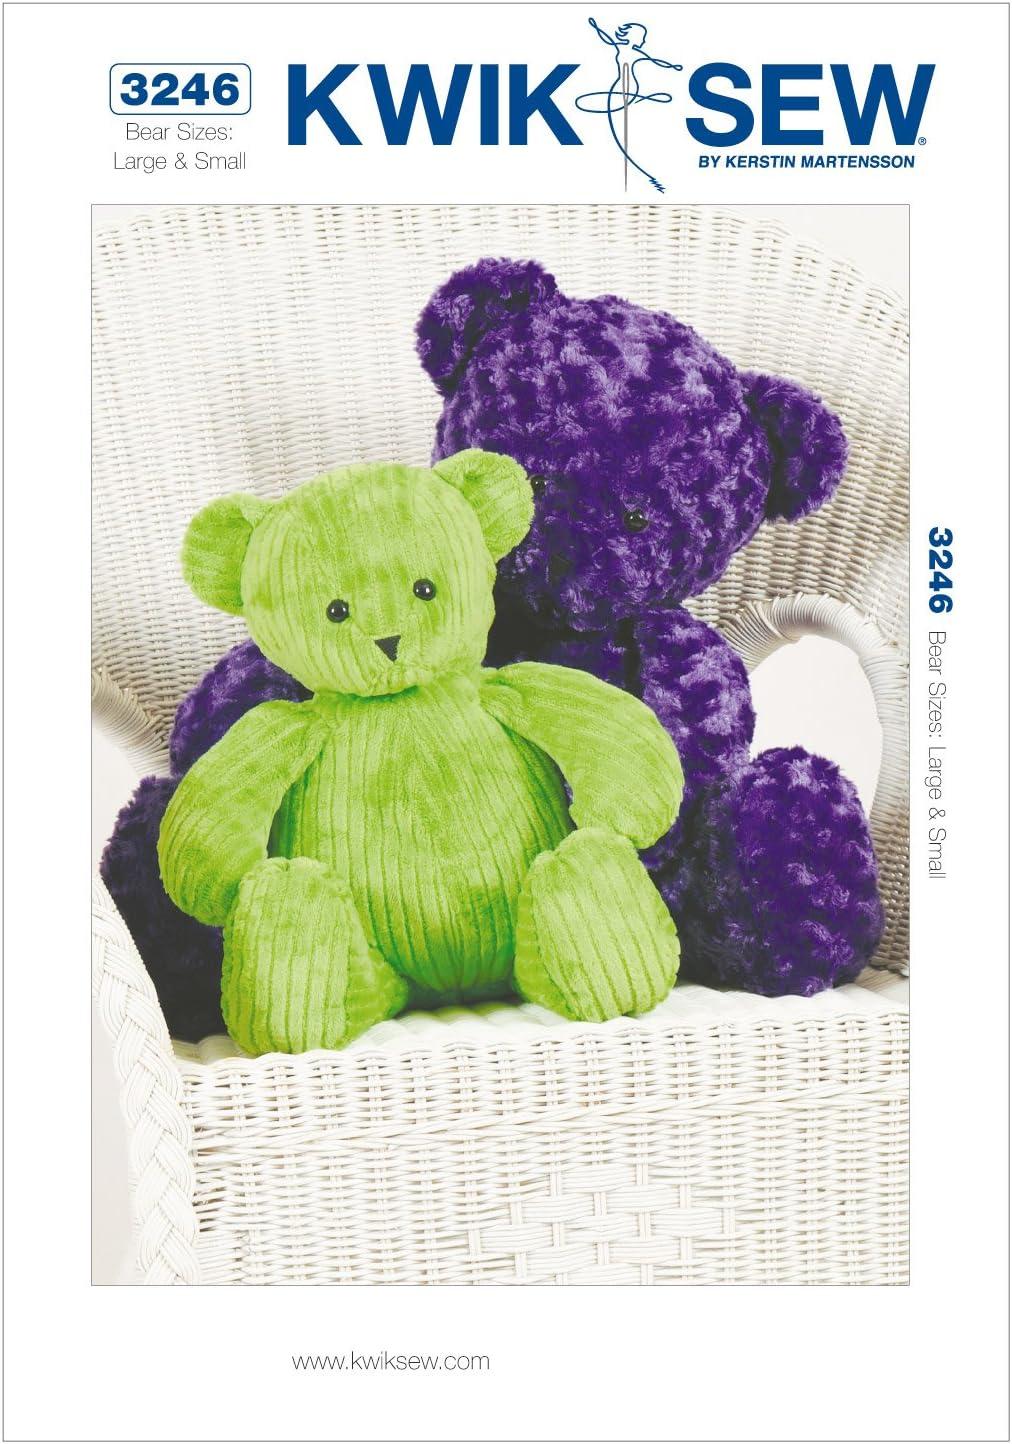 KWIK-SEW PATTERNS K3246OSZ Teddy Bears Sewing Pattern, Size Large and Small